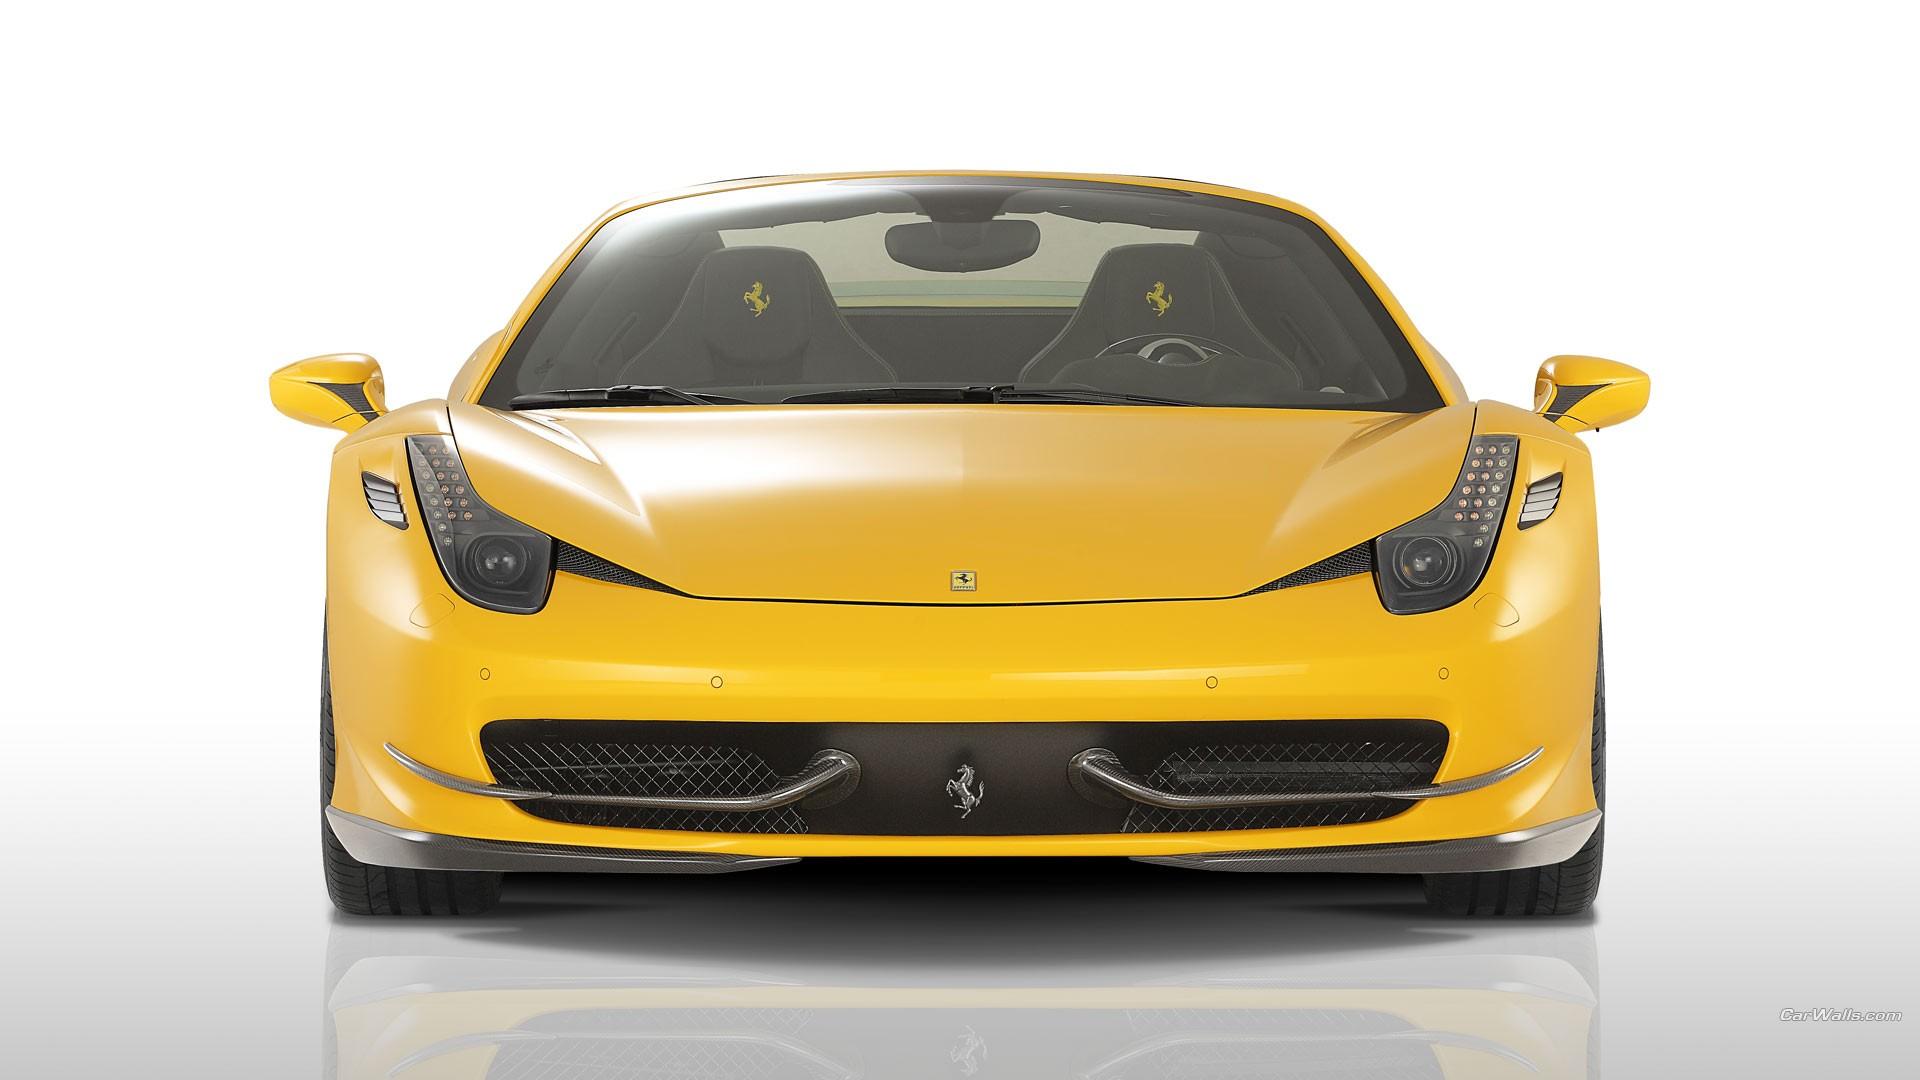 Wallpaper 1920x1080 Px Ferrari 458 Supercars 1920x1080